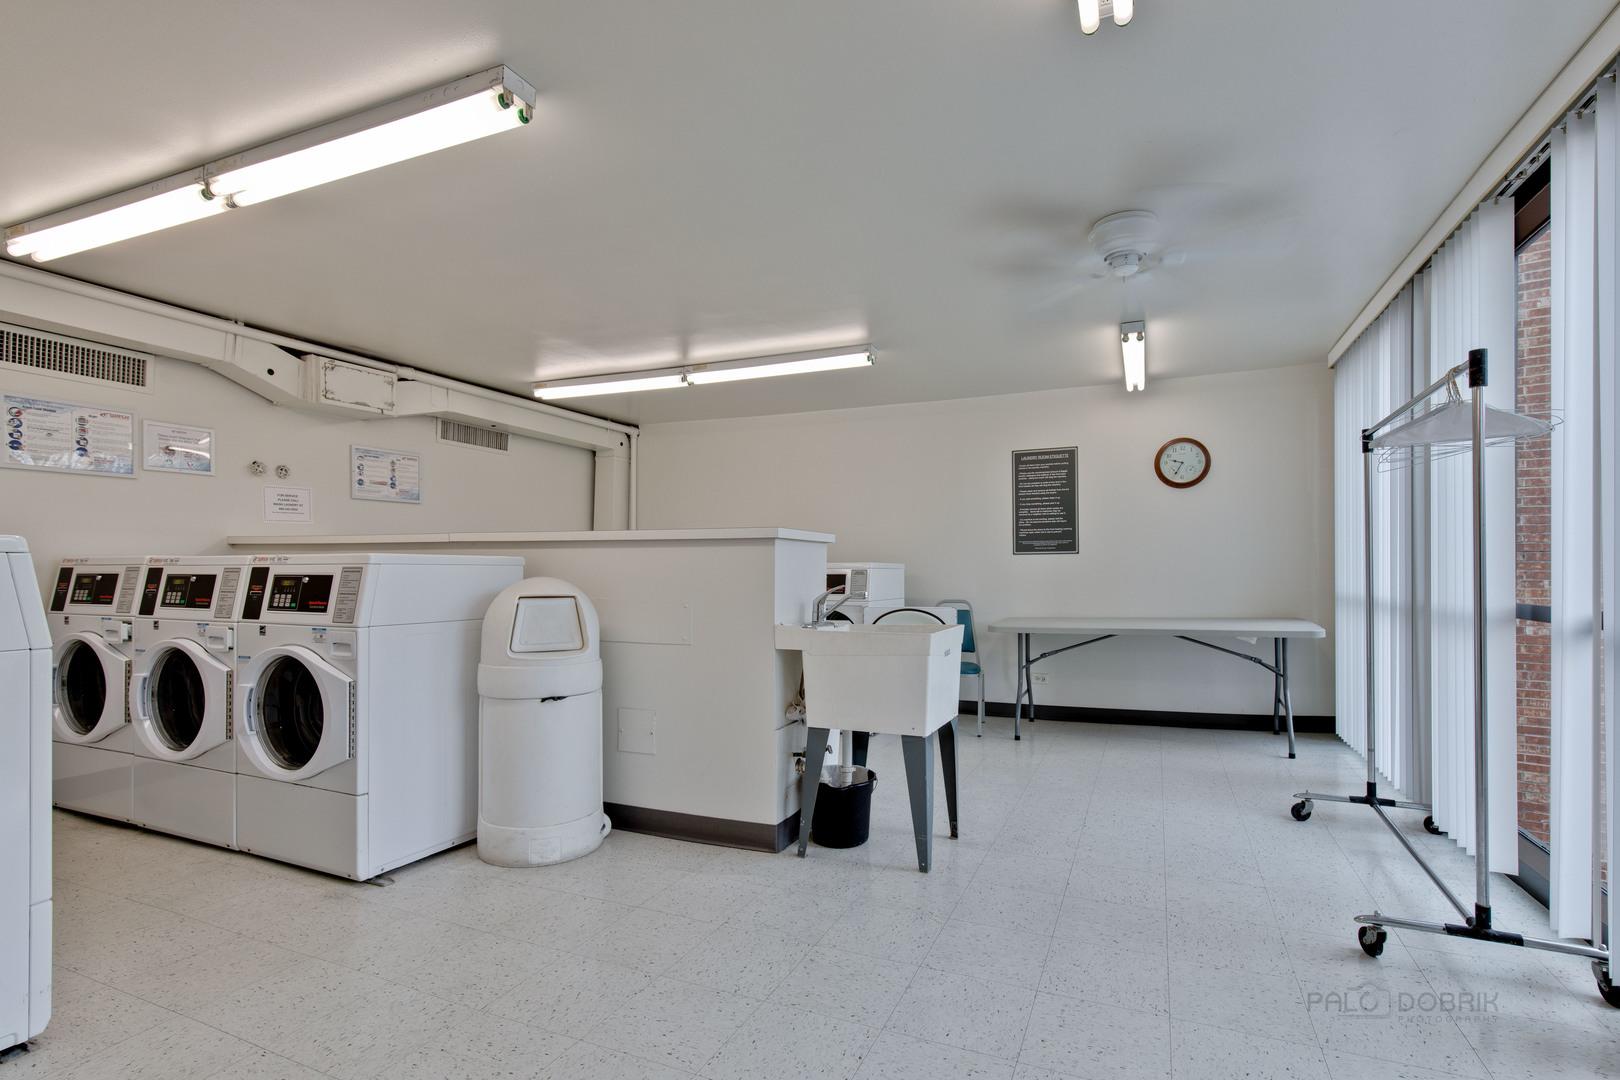 1405 Central Unit Unit 102a ,Arlington Heights, Illinois 60005